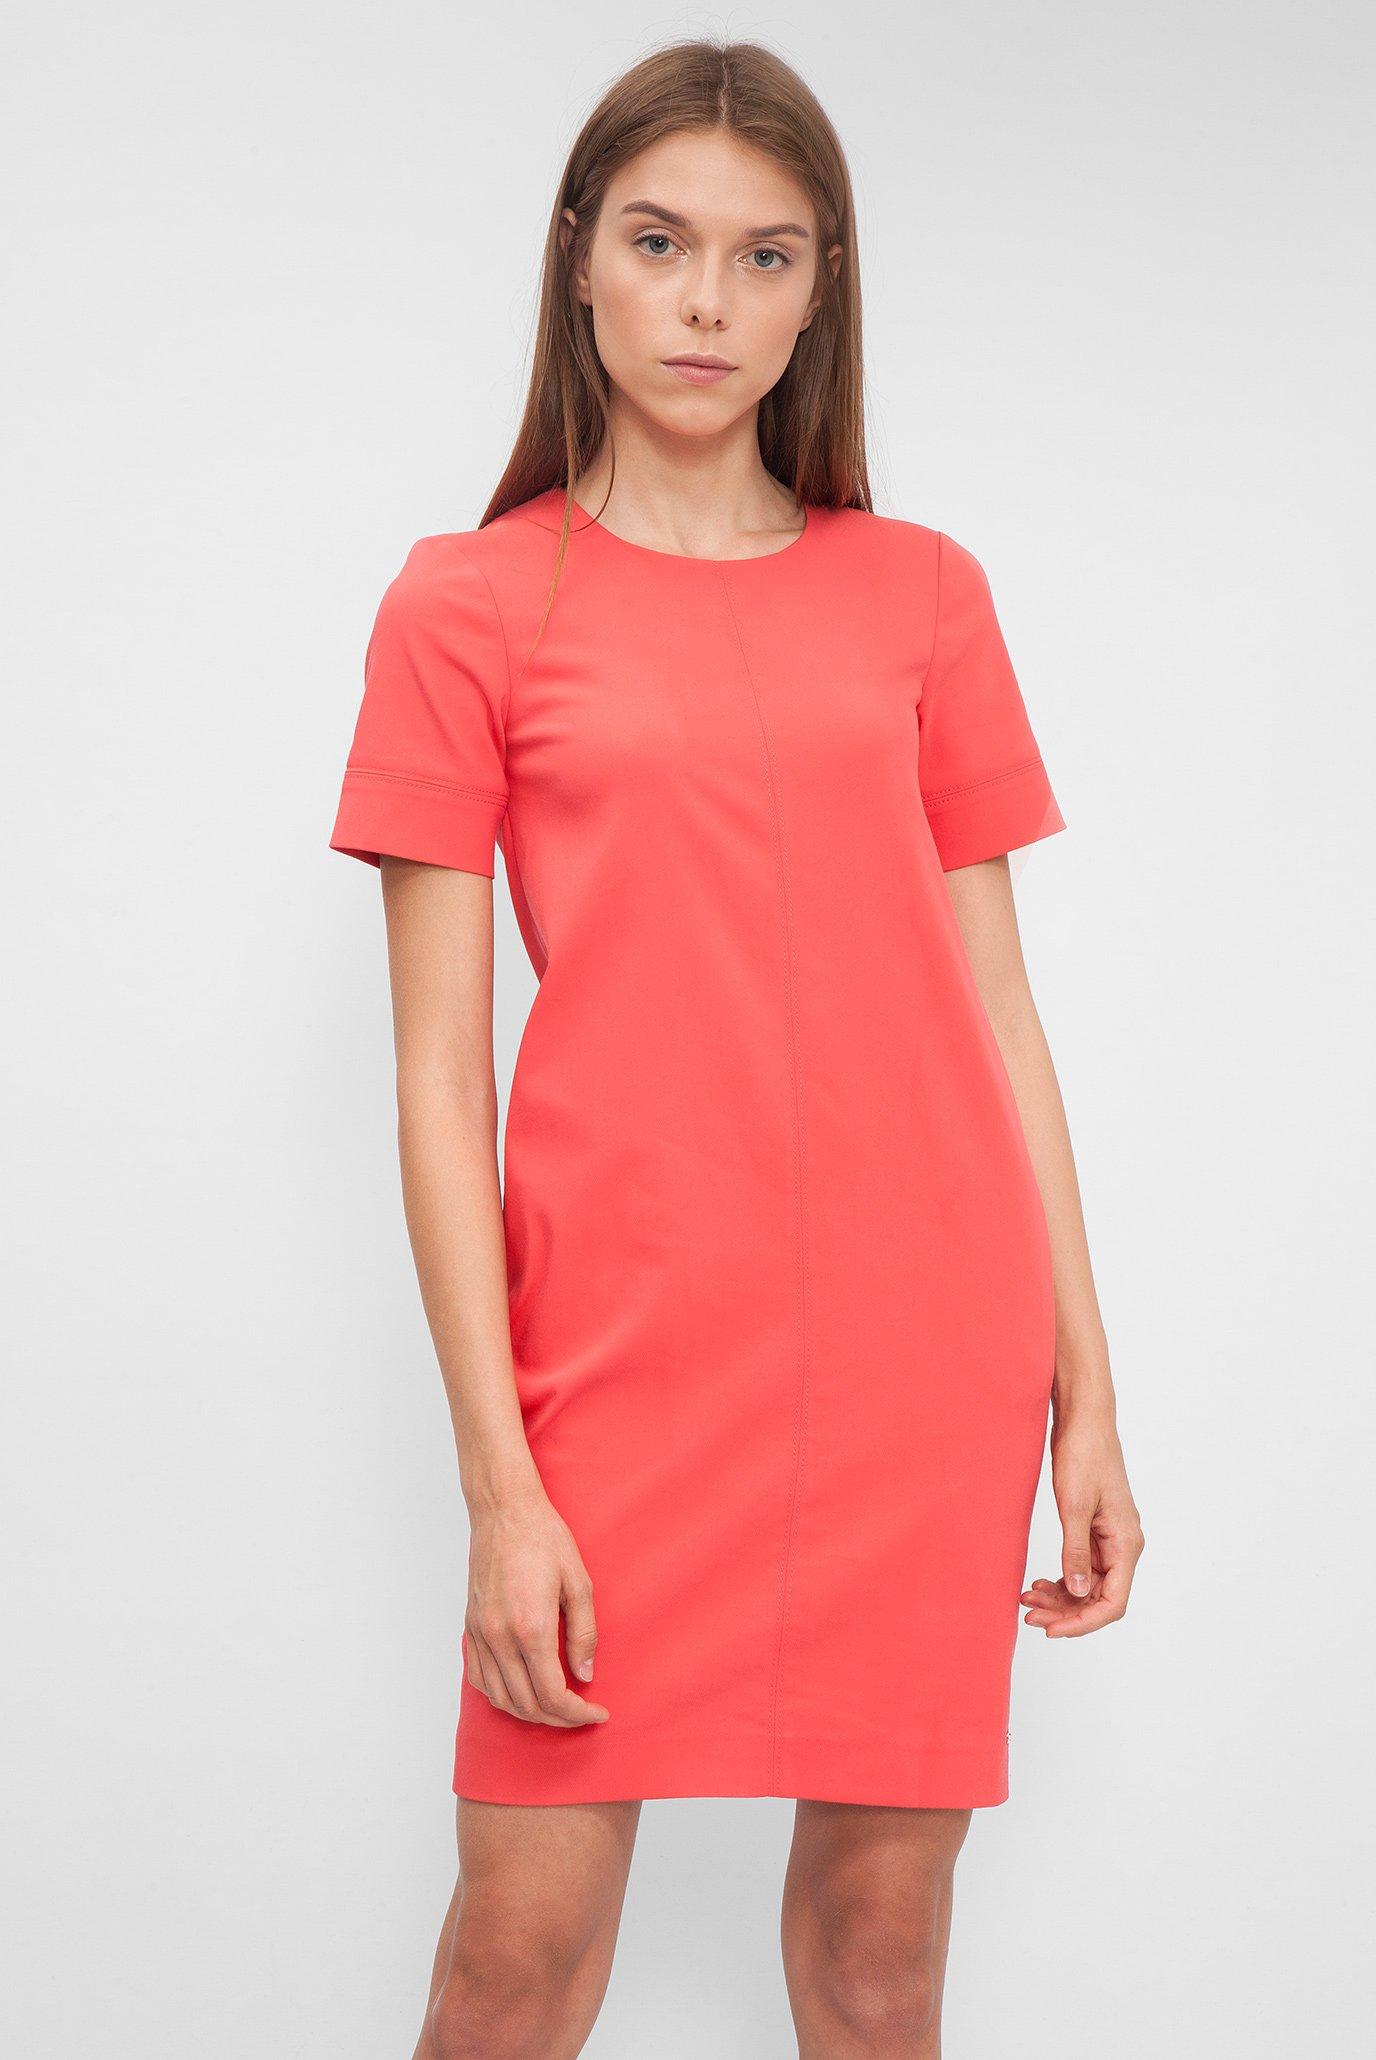 11c02e6a2a9 Купить Женское коралловое платье Josie Dress Tommy Hilfiger Tommy Hilfiger  WW0WW10768 – Киев